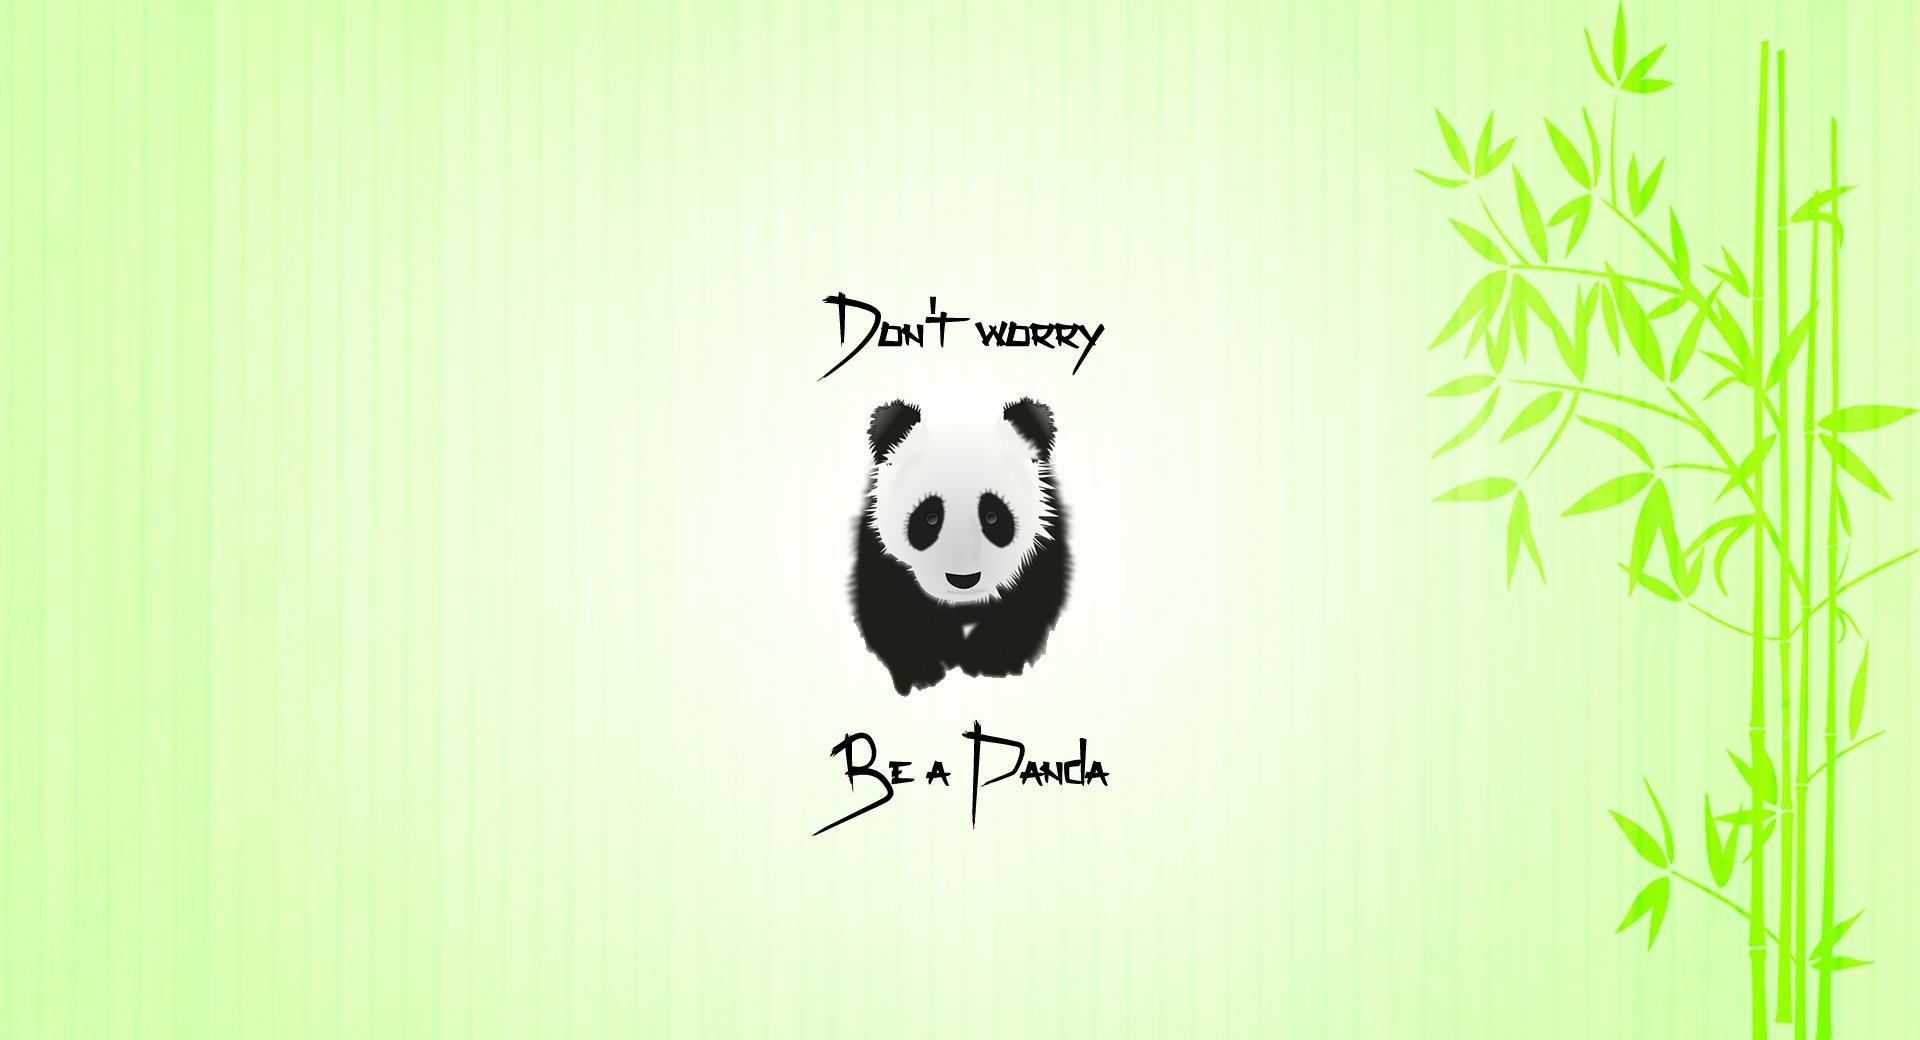 Be a Panda wallpapers HD quality